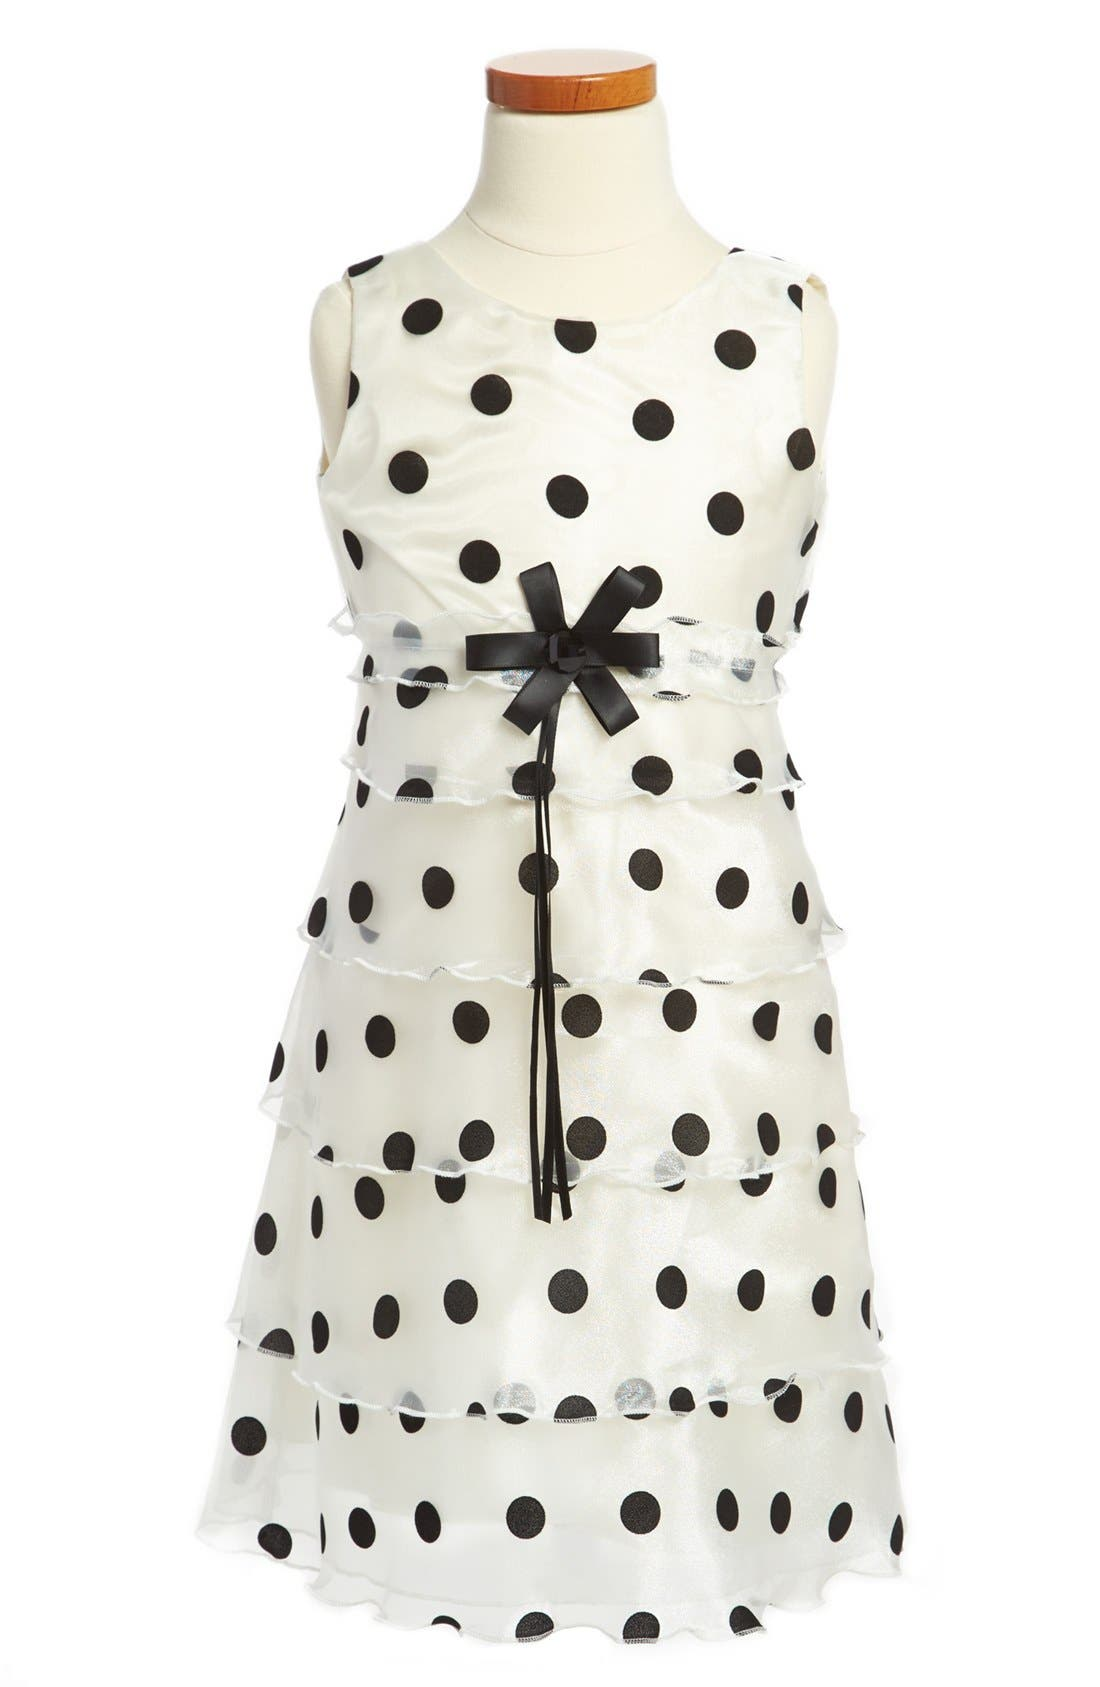 Alternate Image 1 Selected - Dorissa 'Dotty' Shimmer Tier Party Dress (Little Girls)